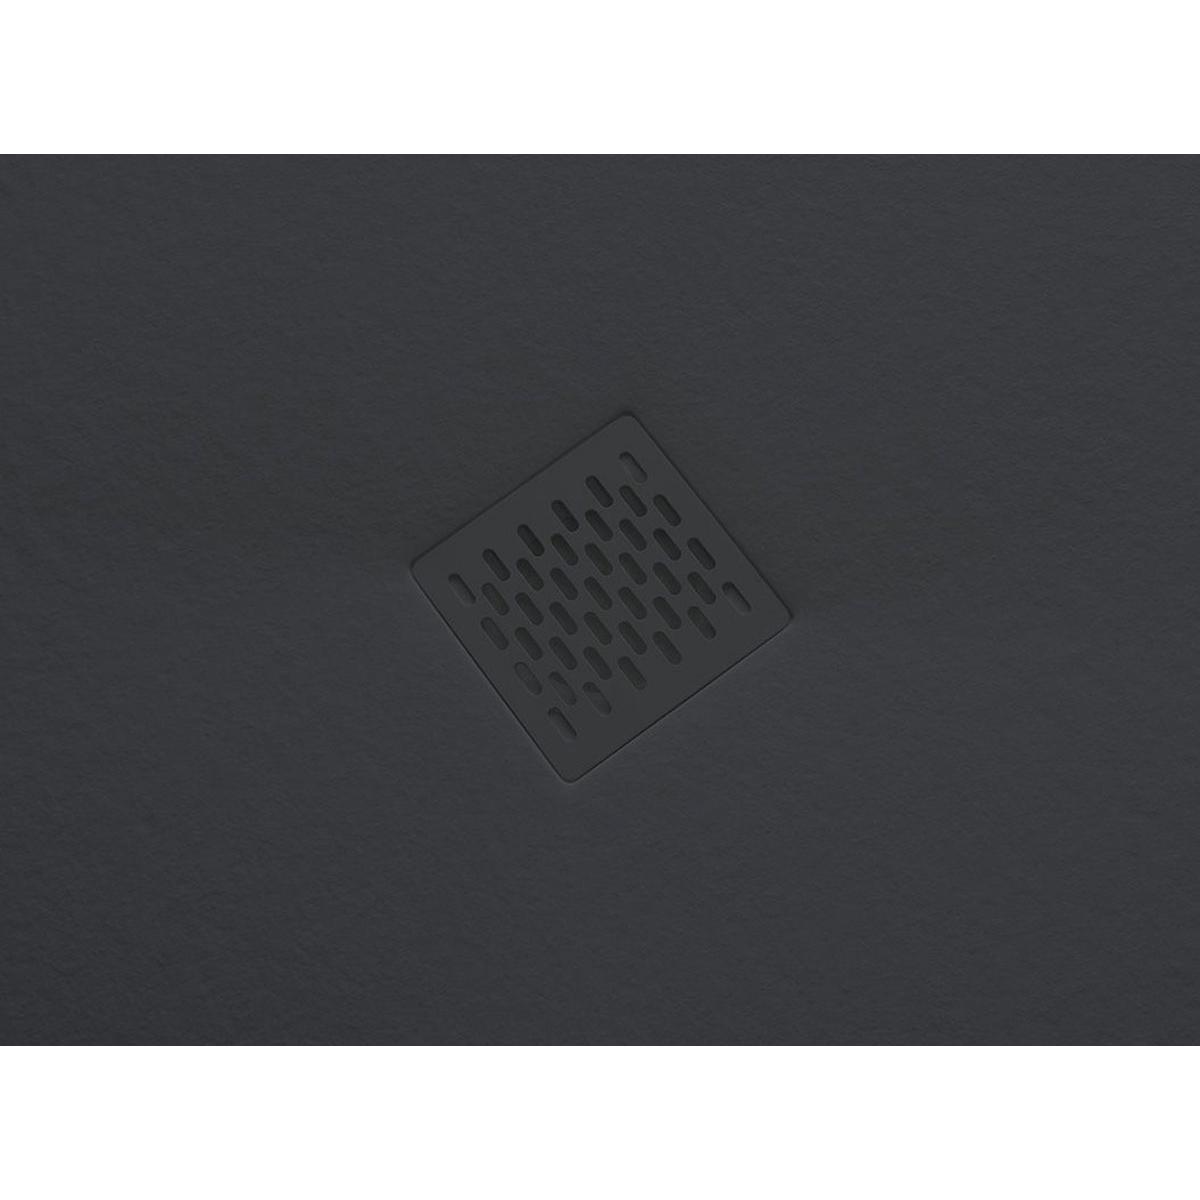 Plato de ducha rectangular 120x80 Ares Stone Nox Grafito